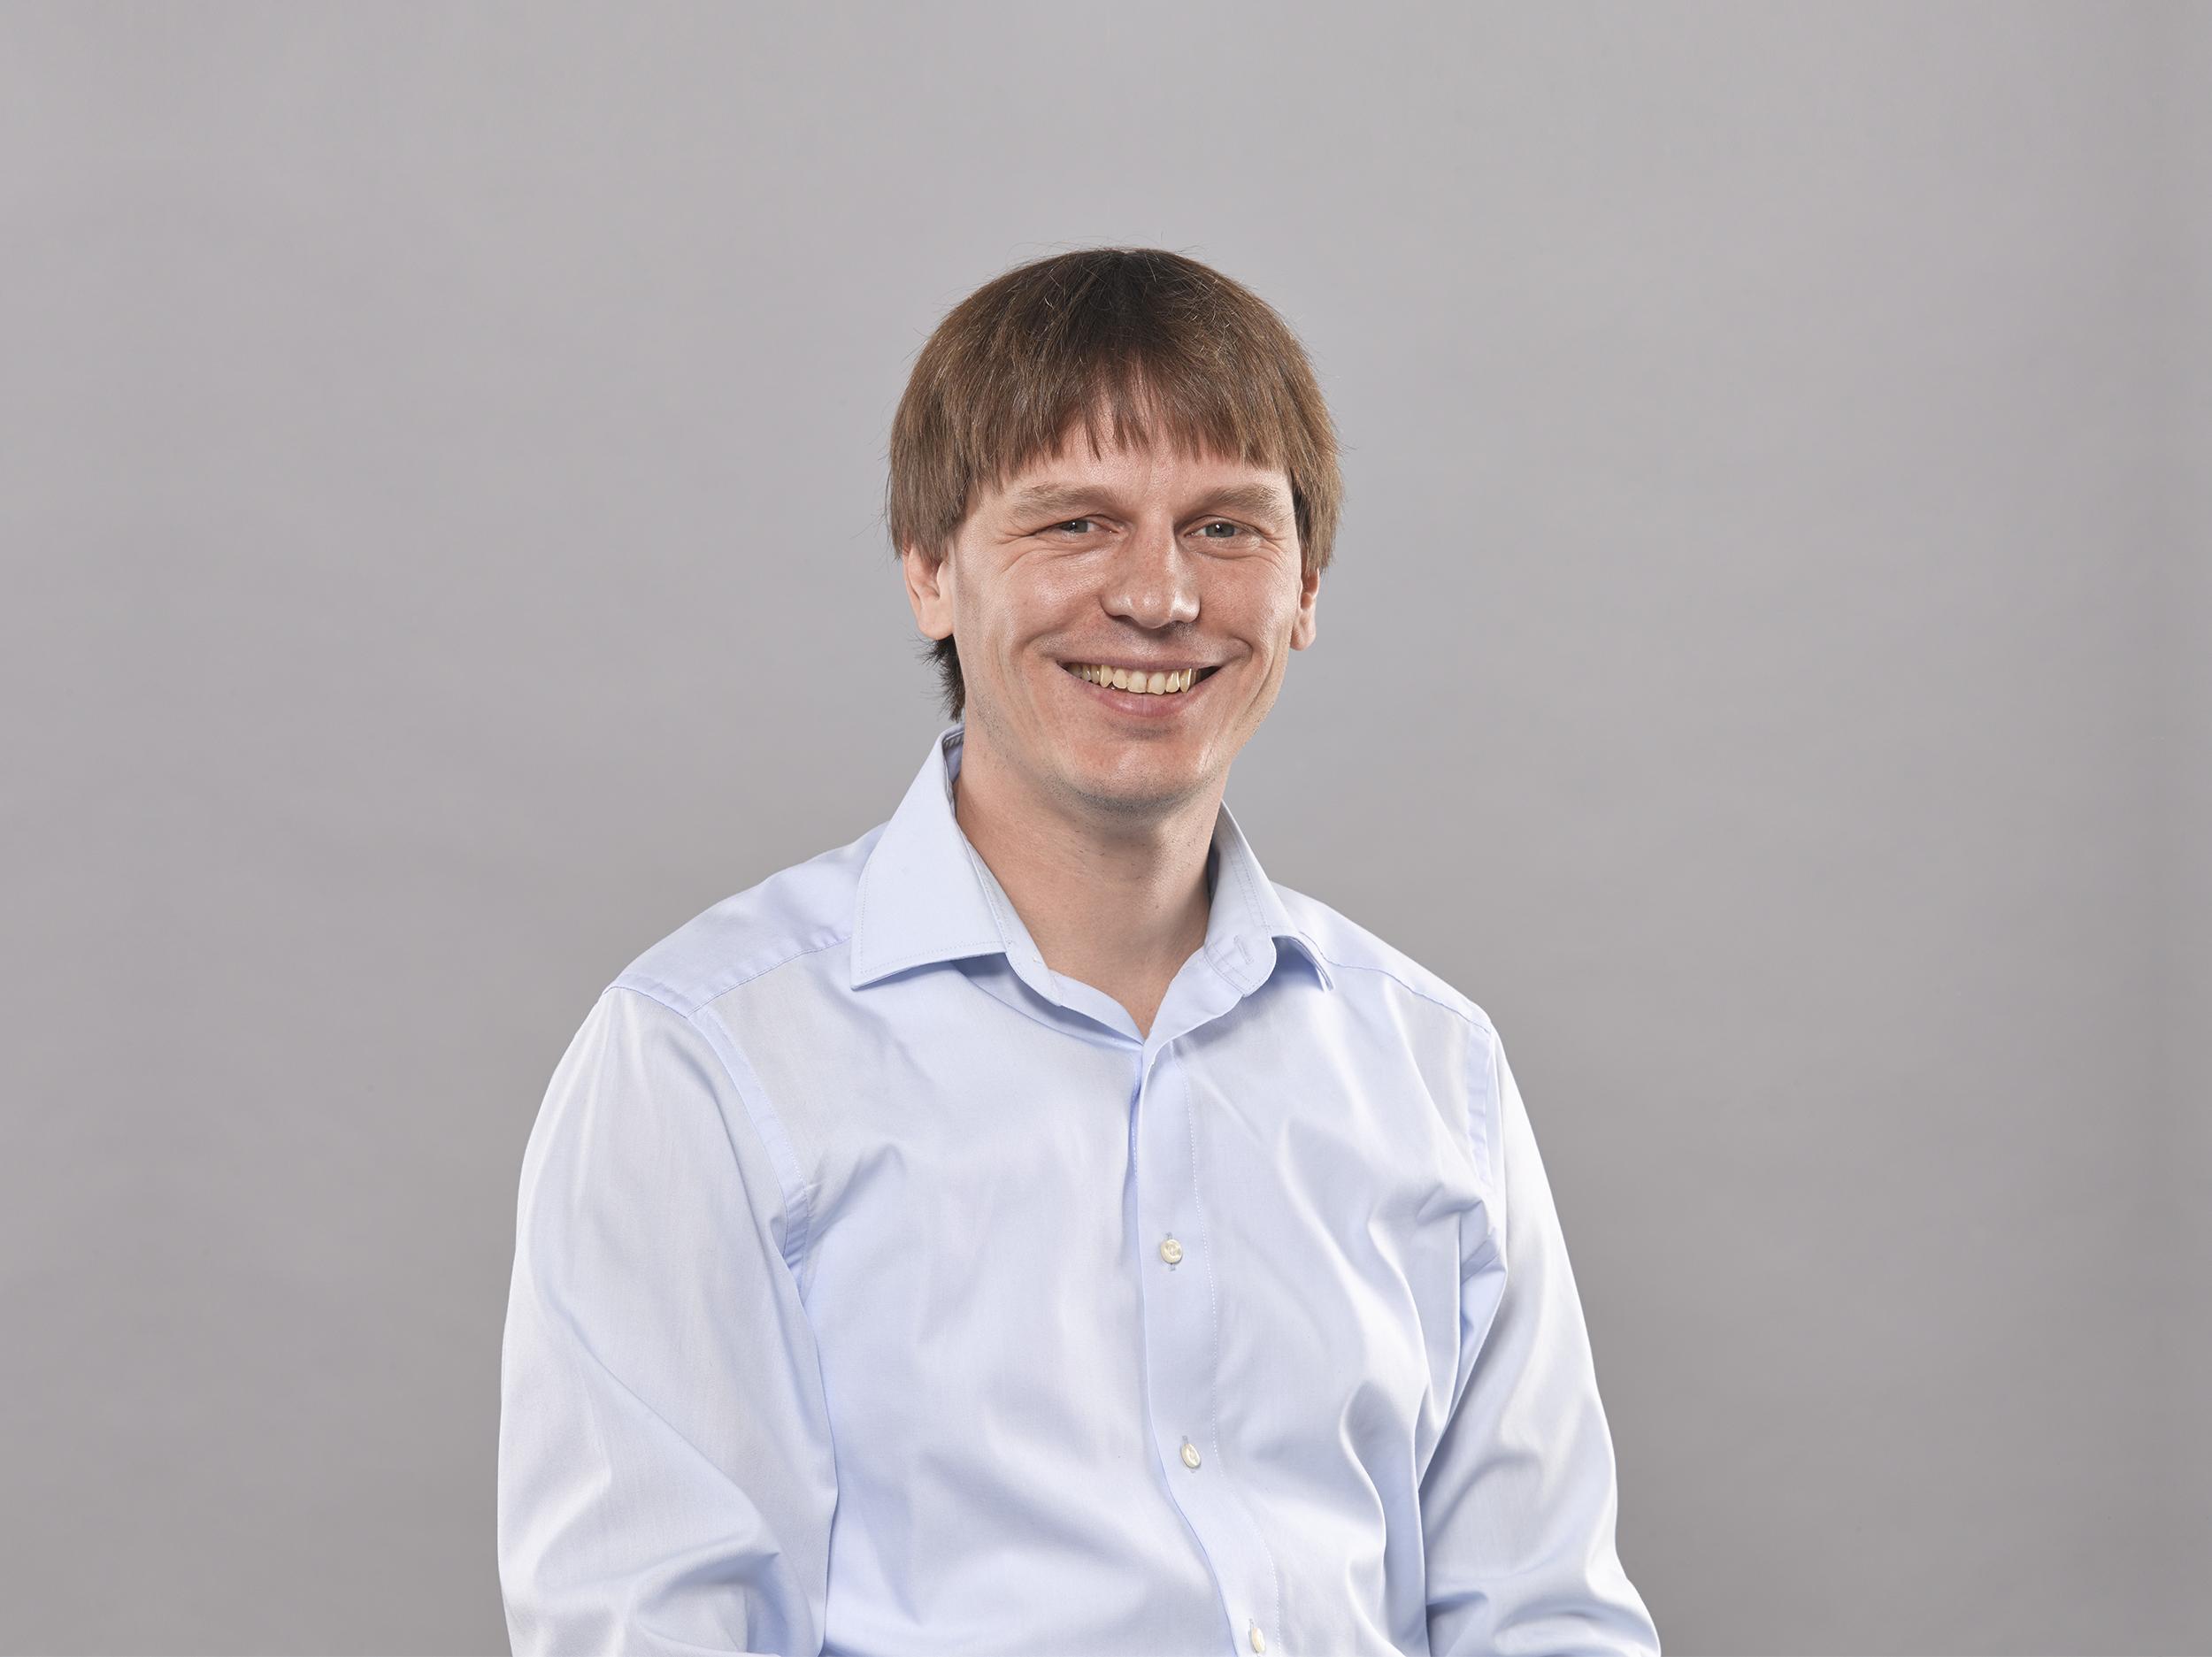 Mathias Mehr